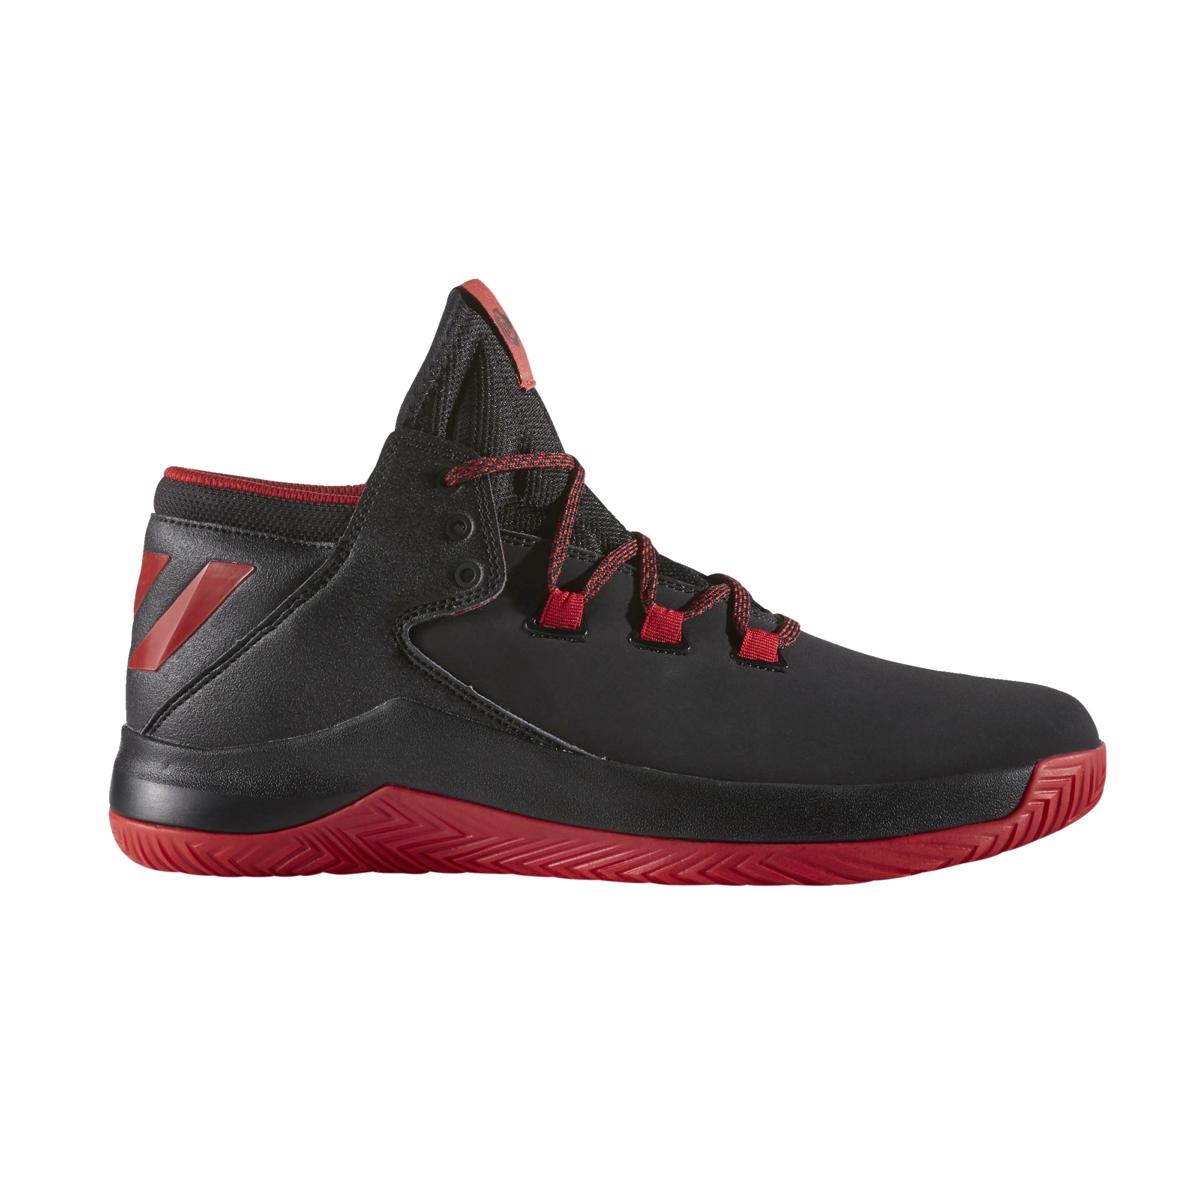 Adidas Basketball Shoes Price List